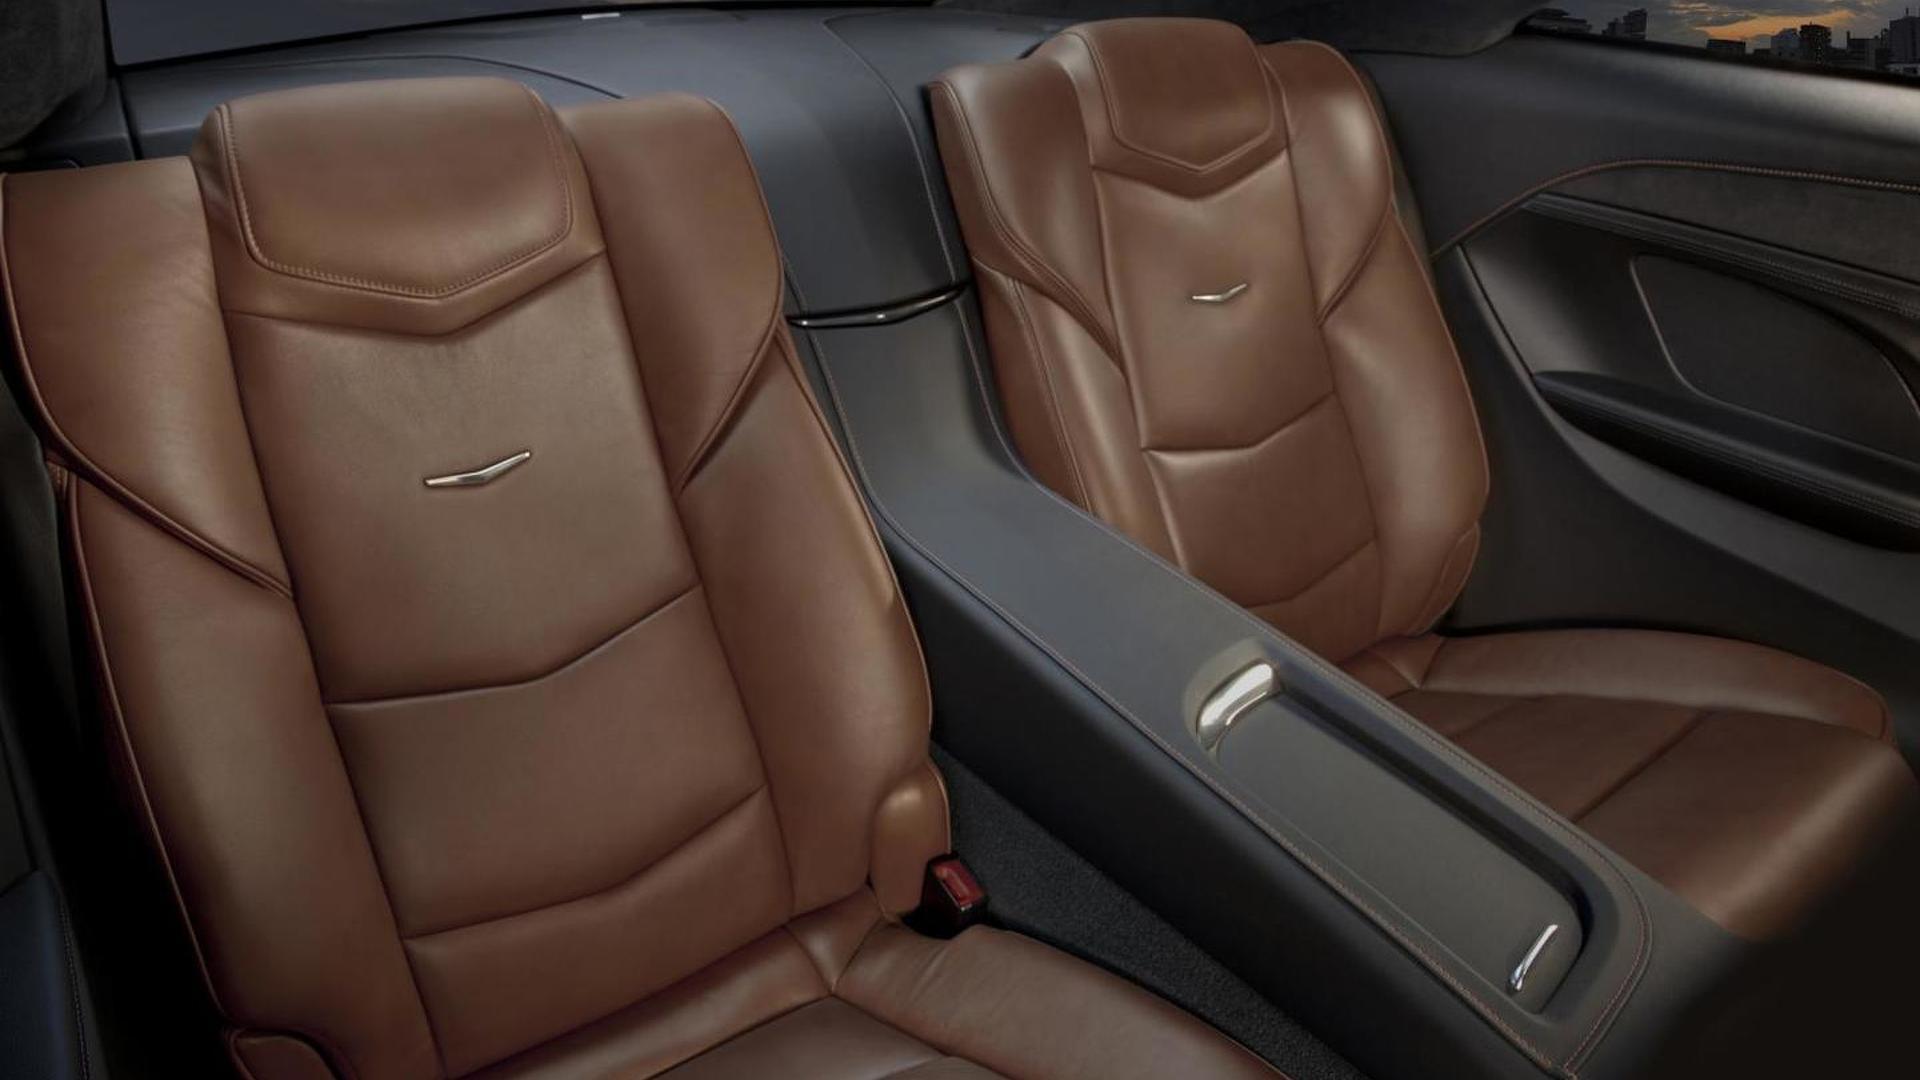 Cadillac ELR gets regenerative braking on demand via shift paddles [video]